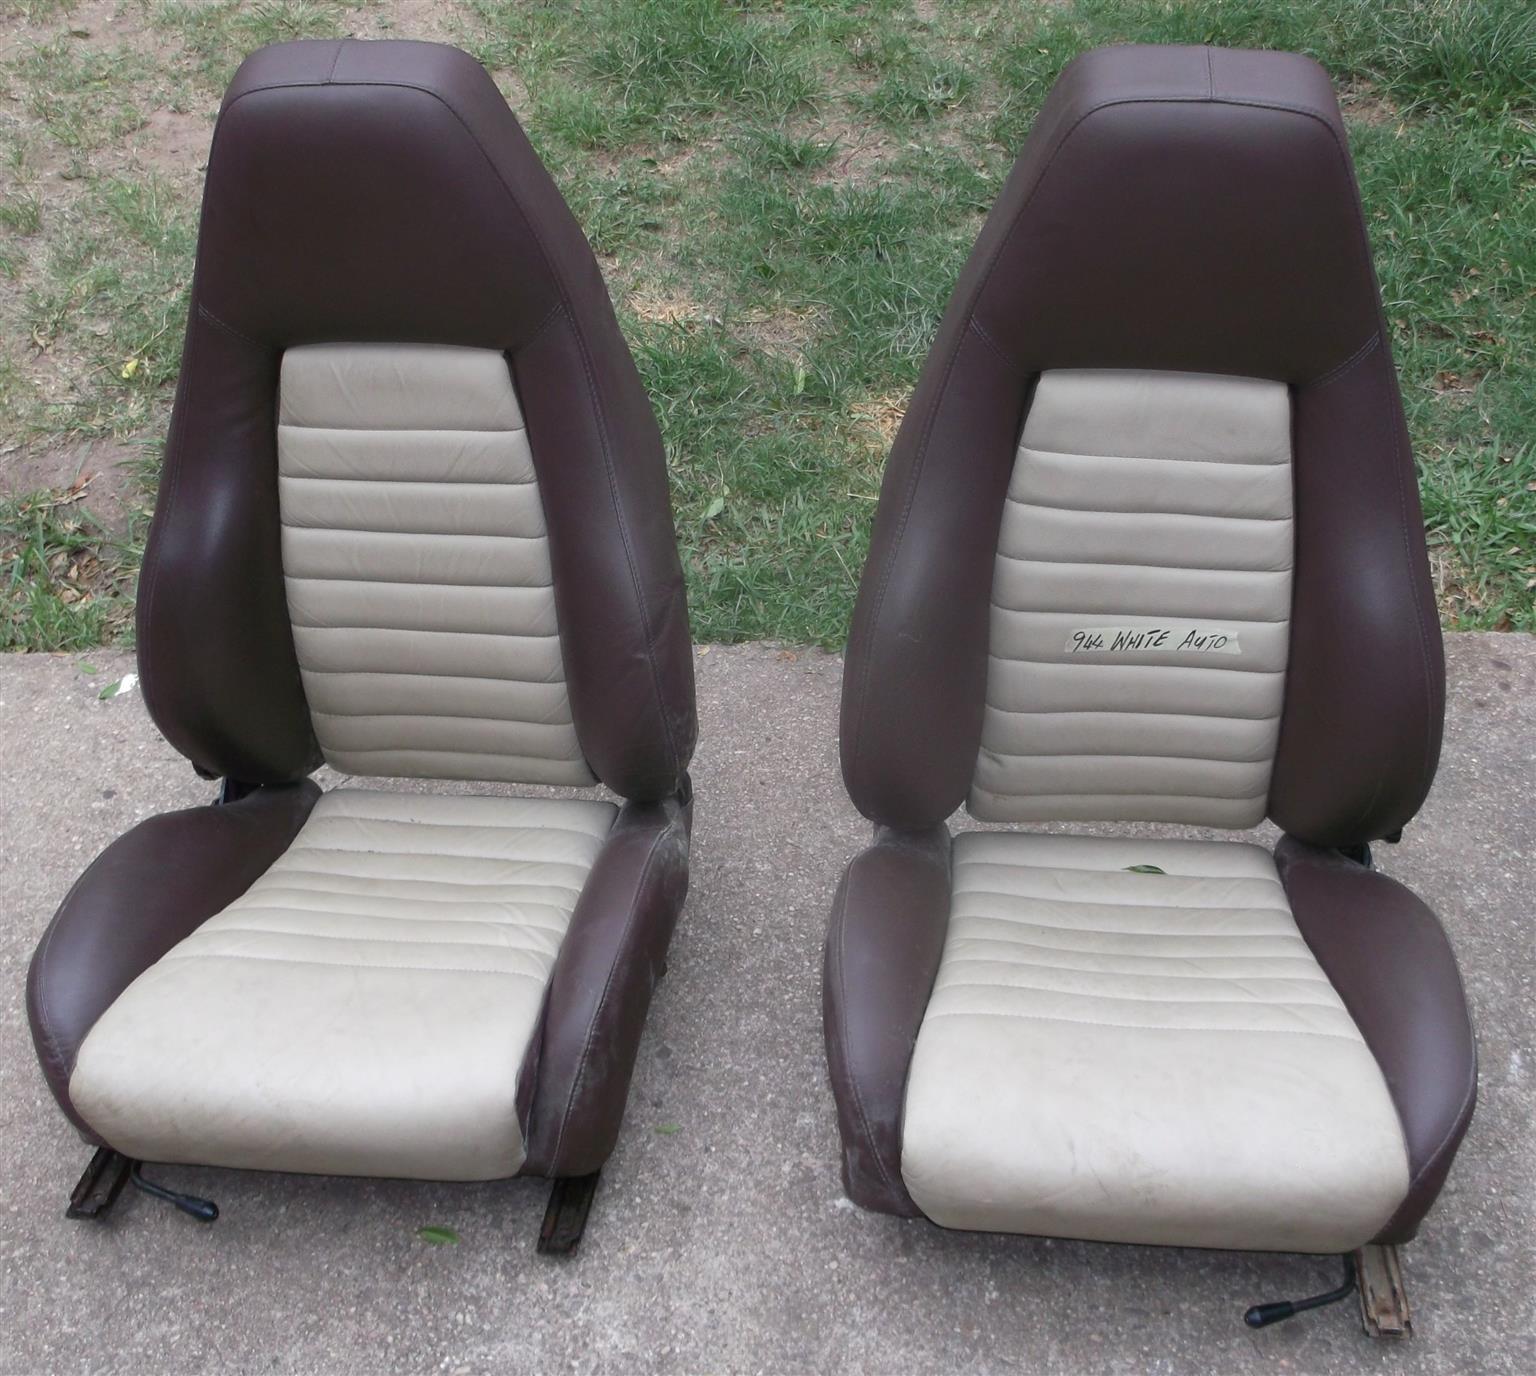 Porsche Original Tombstone Style Seats For Sale Junk Mail